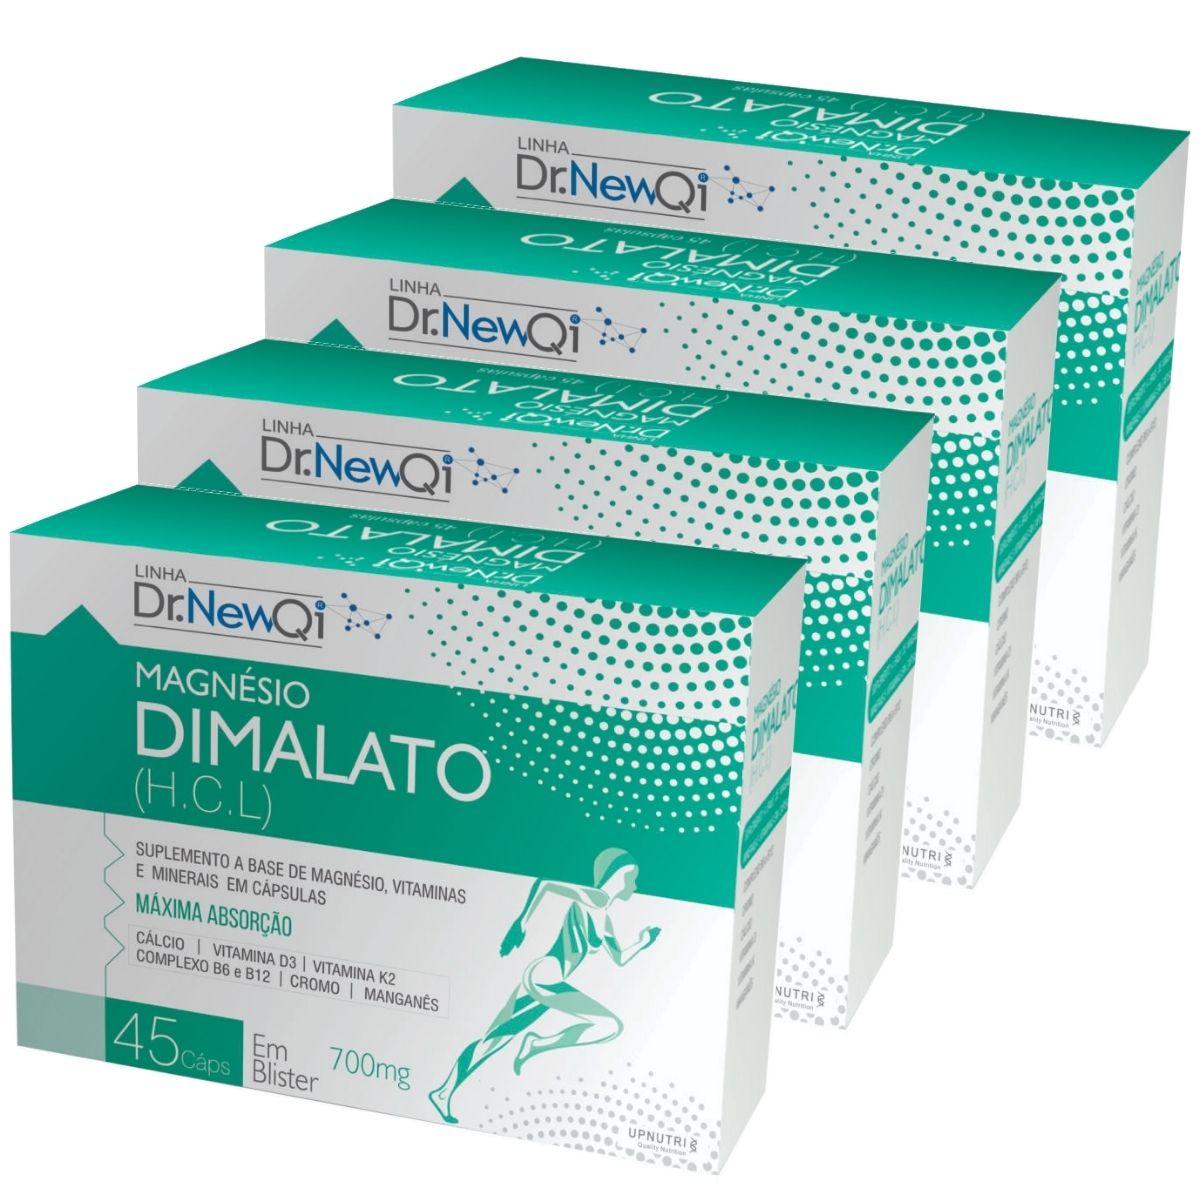 4x Magnésio Dimalato HCL 45 Cápsulas 700mg Dr. New Qi - Upnutri